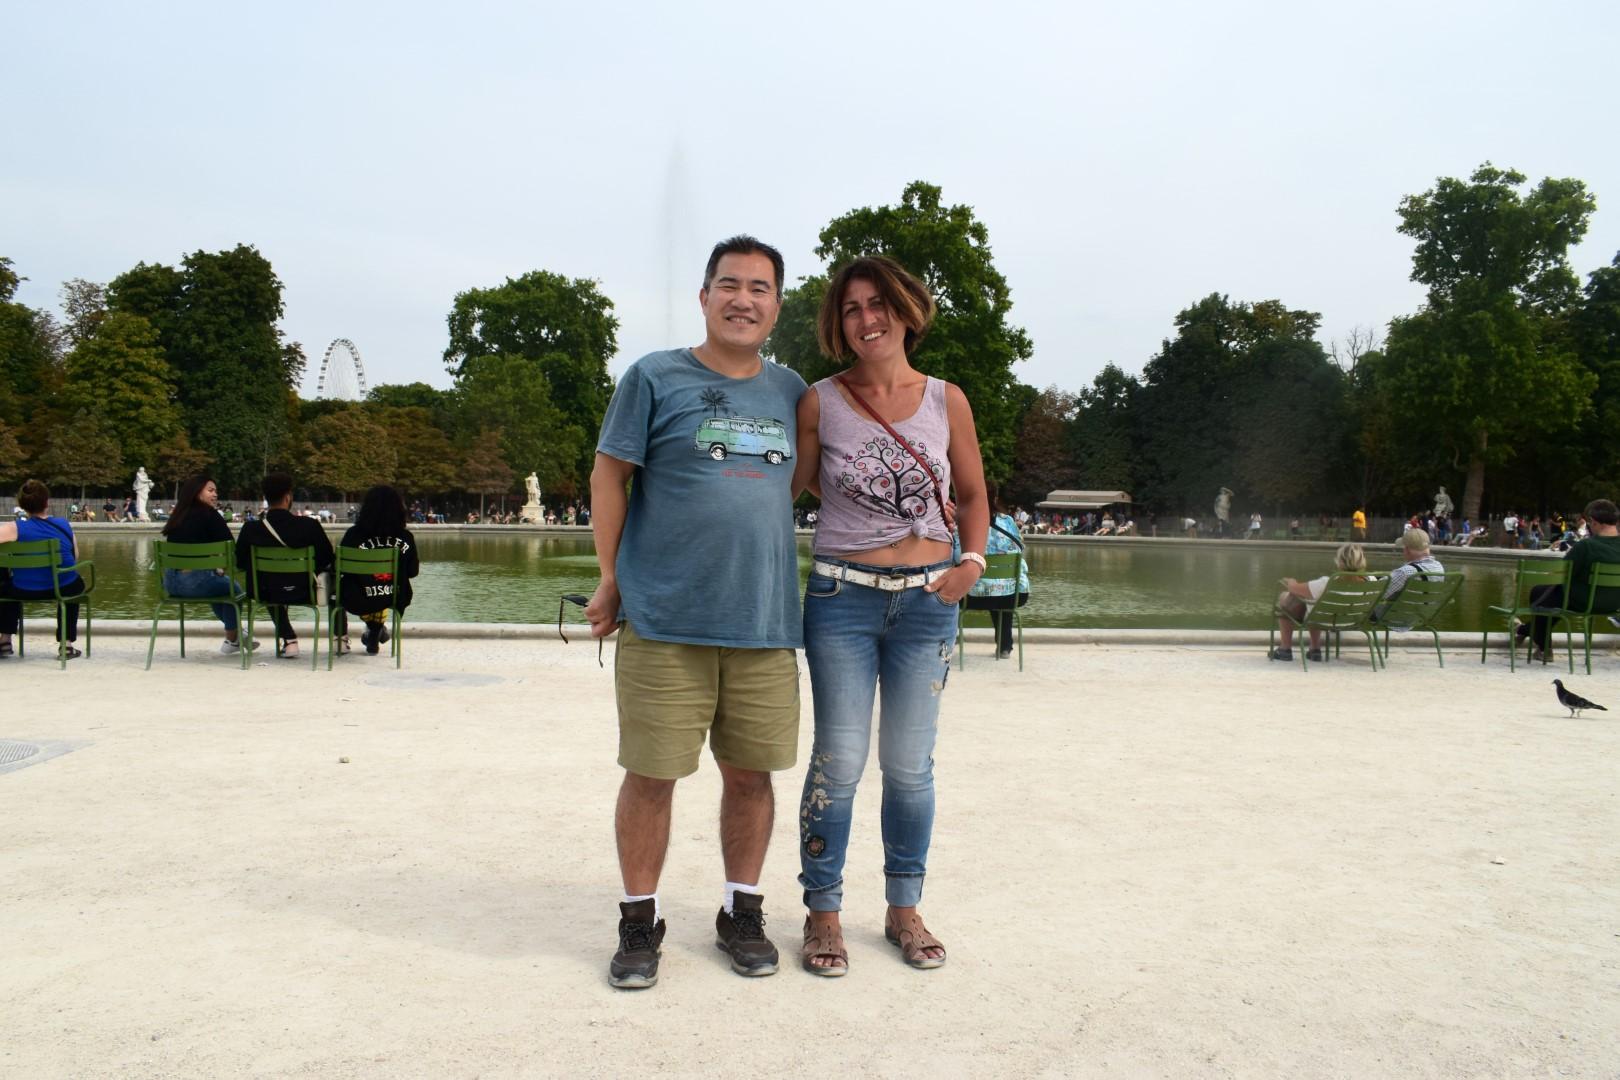 Bassin octogonal, Jardin des Tuileries, Paris